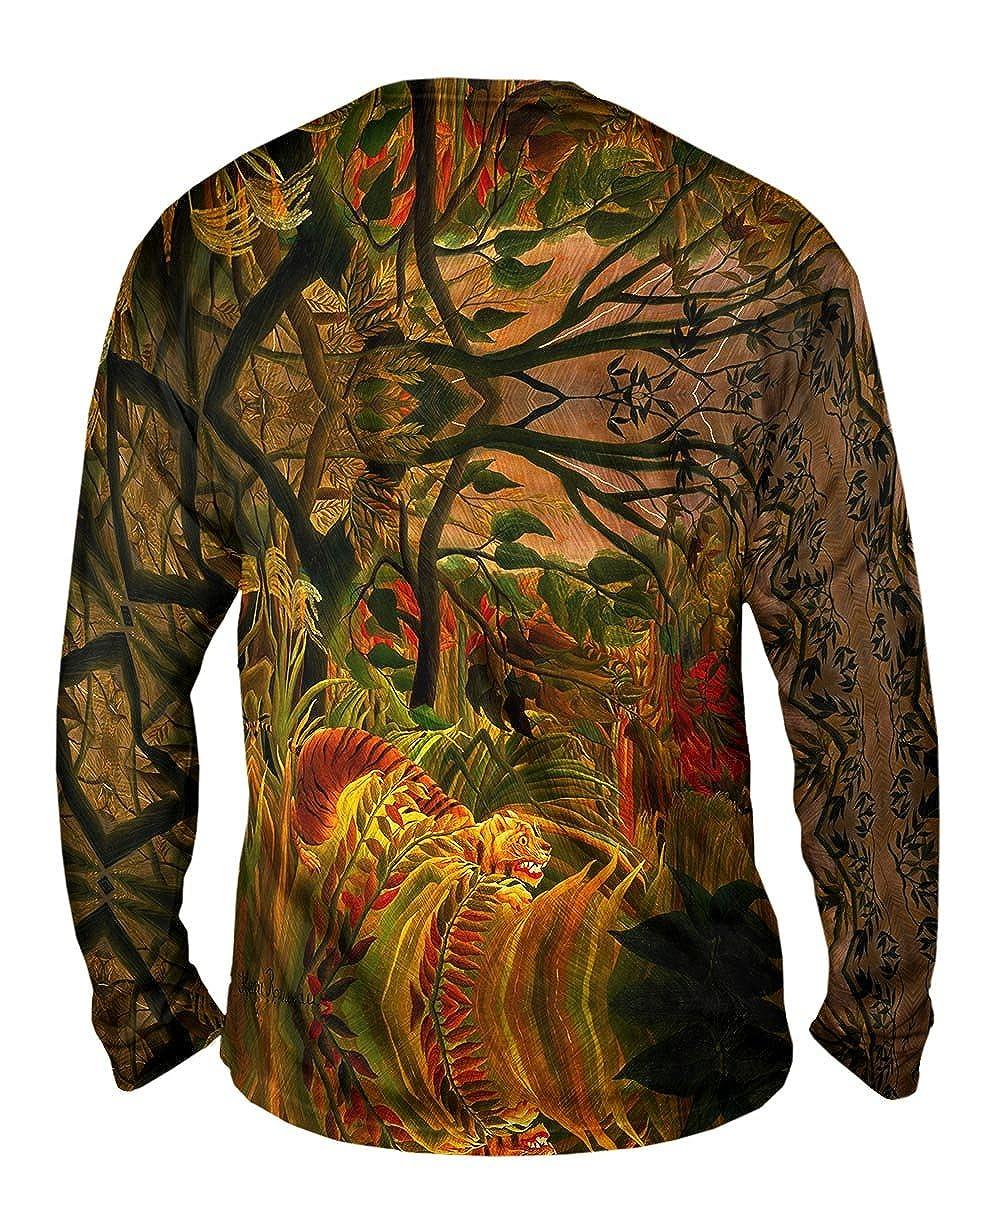 Tiger in a Tropica Yizzam Henri Rousseau Mens Long Sleeve 2499